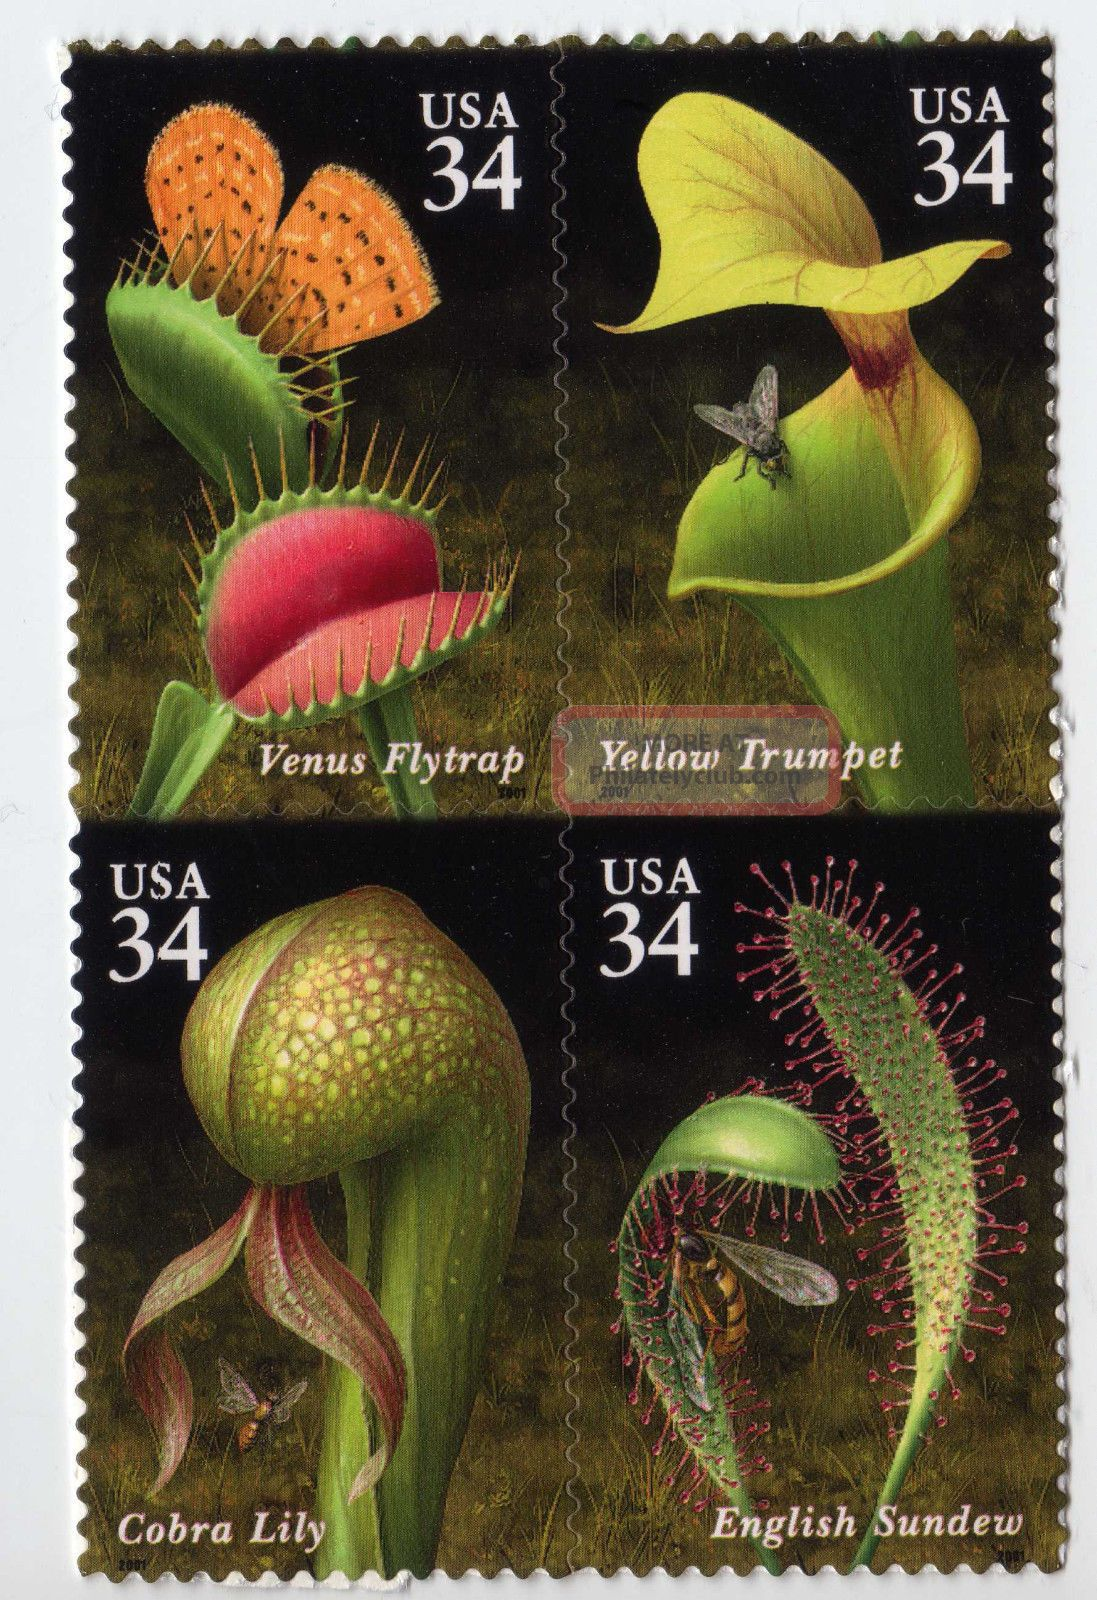 005 Us Stamp Scott 3528 - 3531 34¢ Carnivorous Plants Block Of 4 United States photo